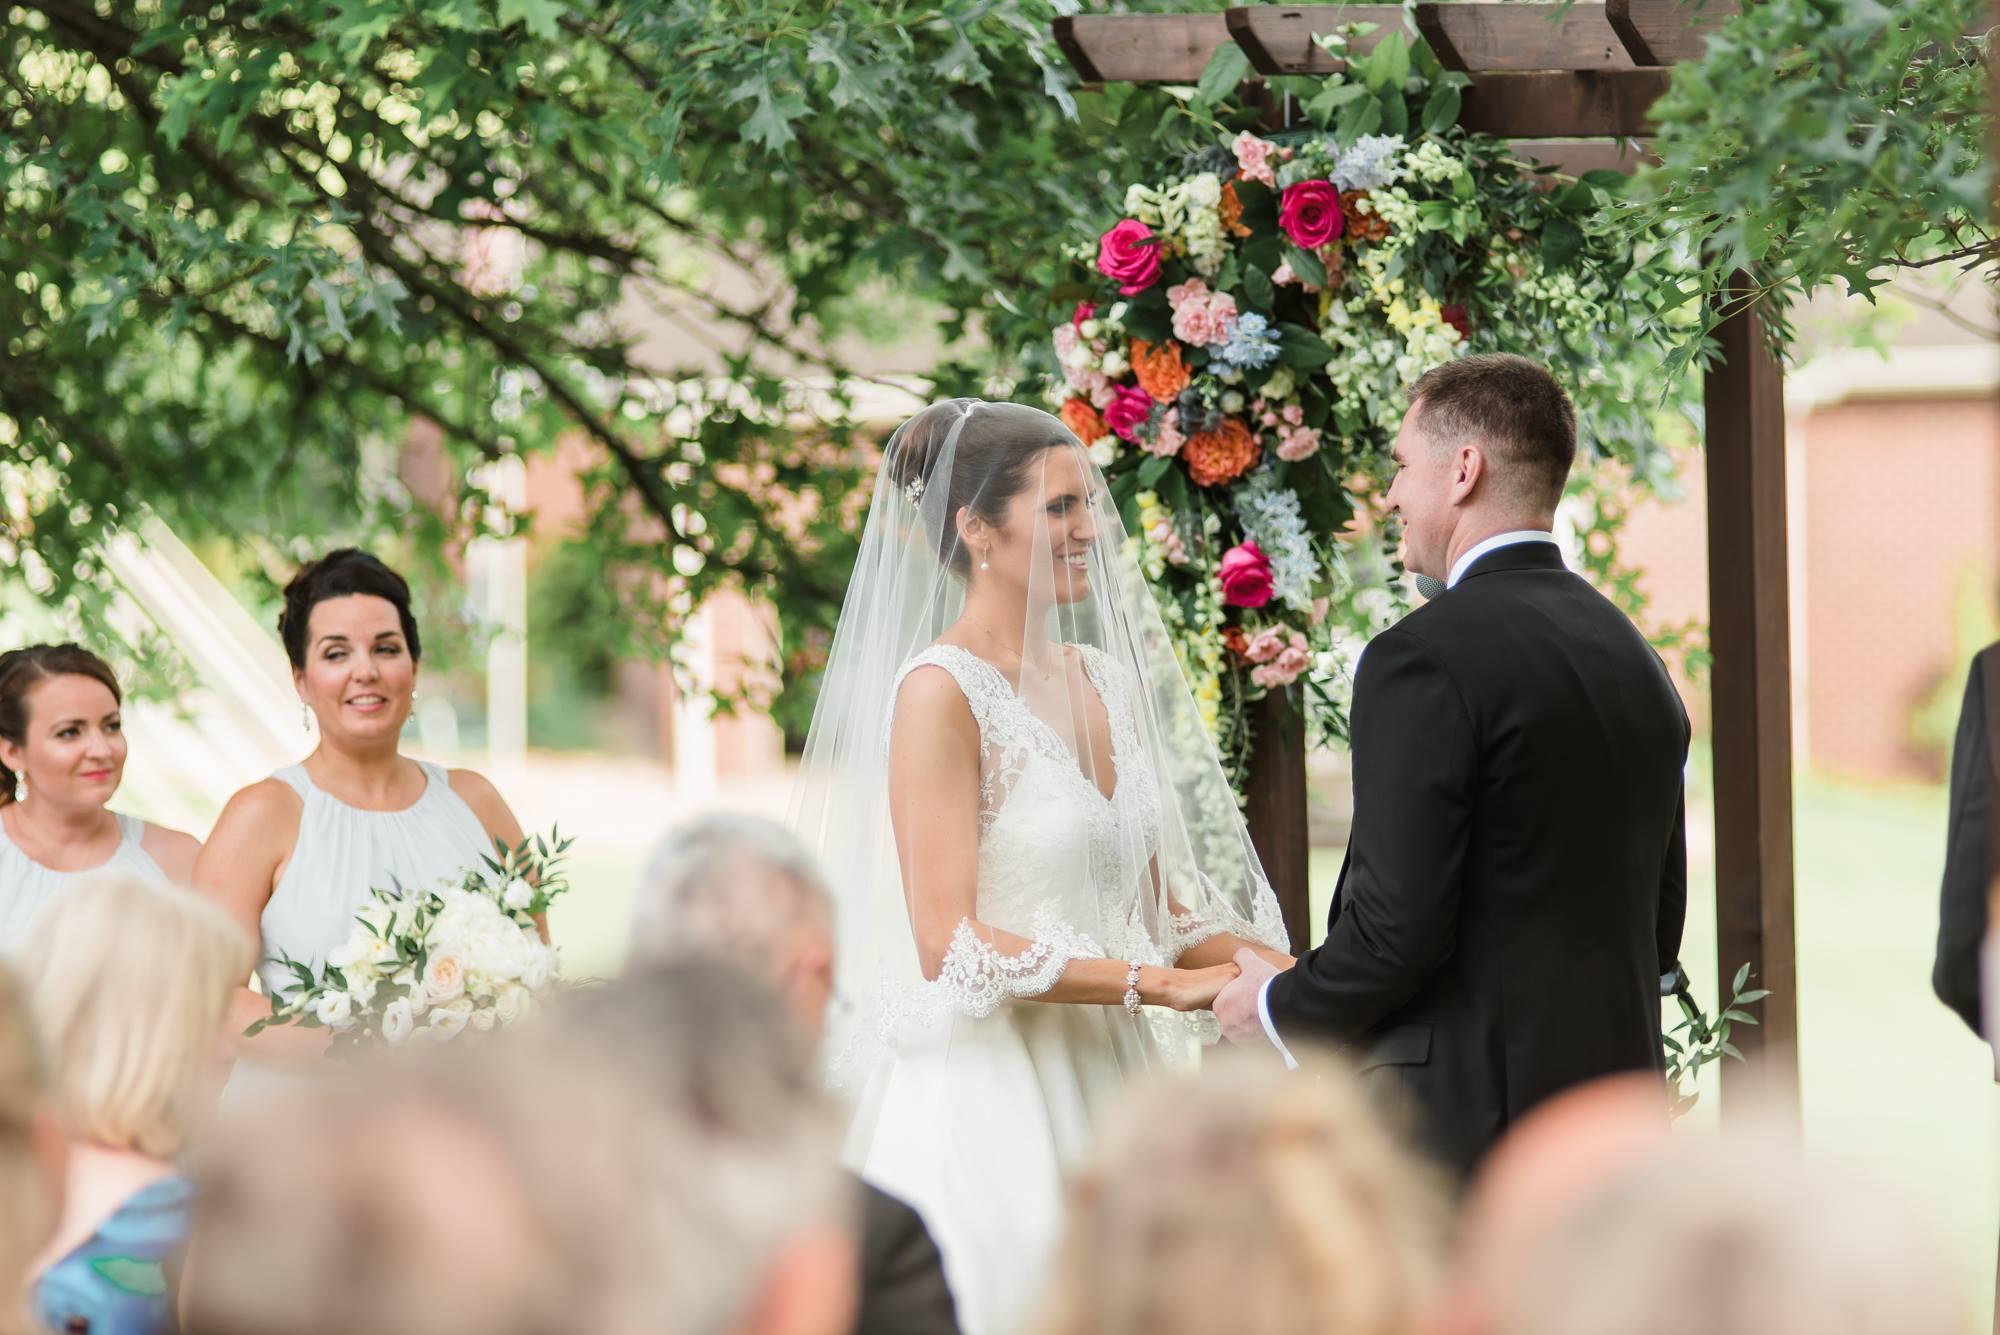 pittsburgh-pennsylvania-backyard-glam-chic-modern-classic-wedding-0024.jpg